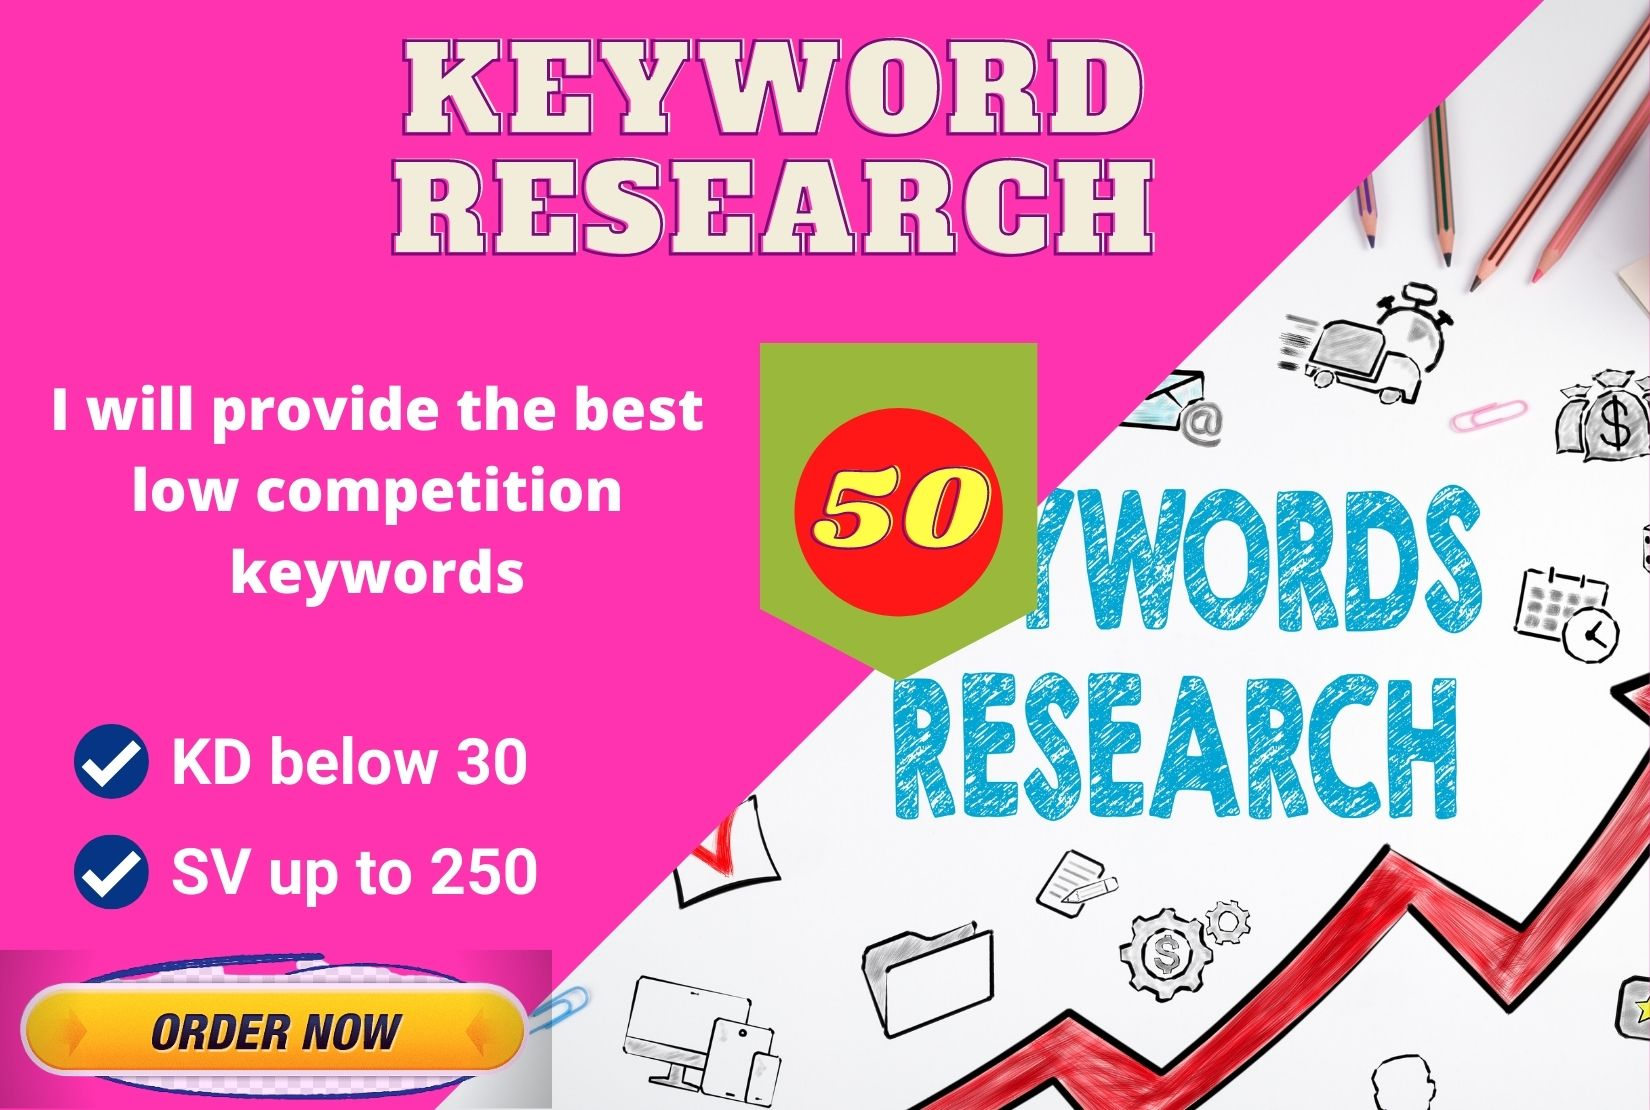 I will research affiliate marketing keyword kd below 30 sv 250 up